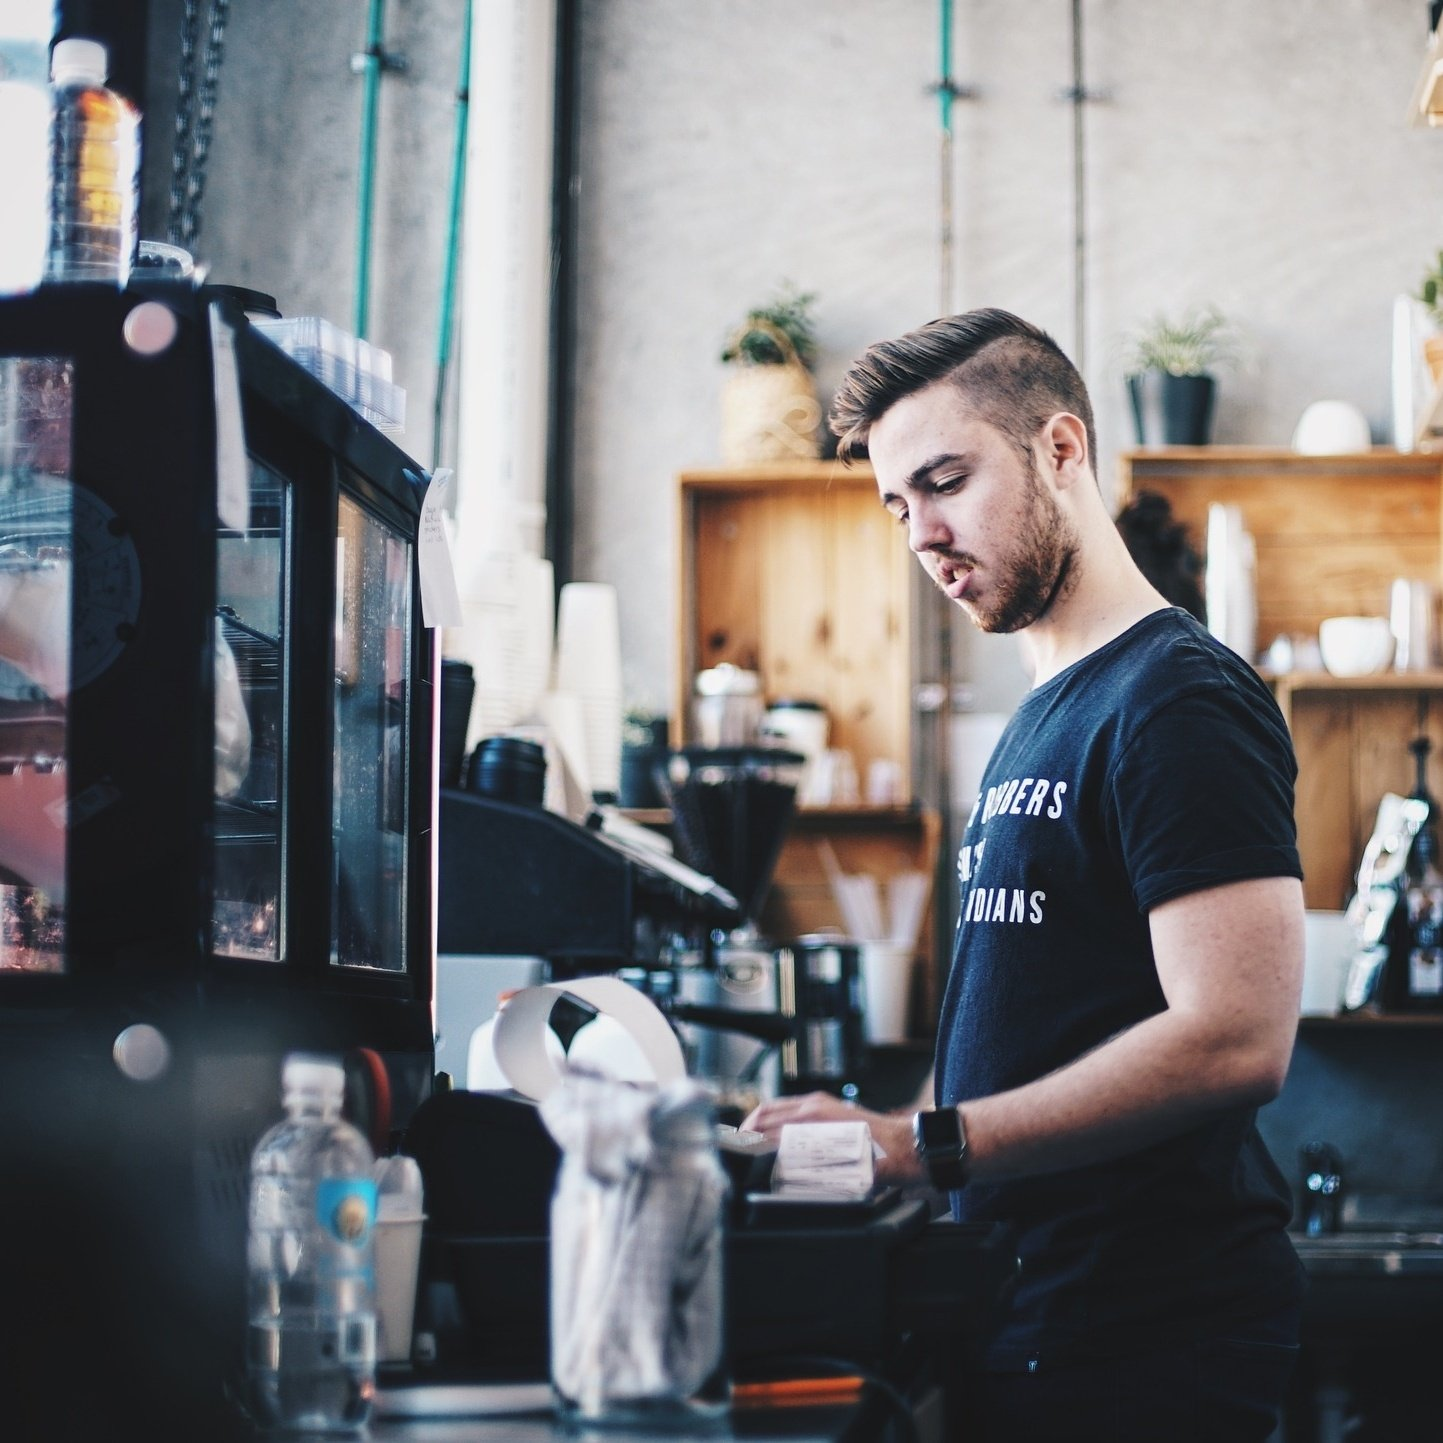 Man working coffee shop.jpg